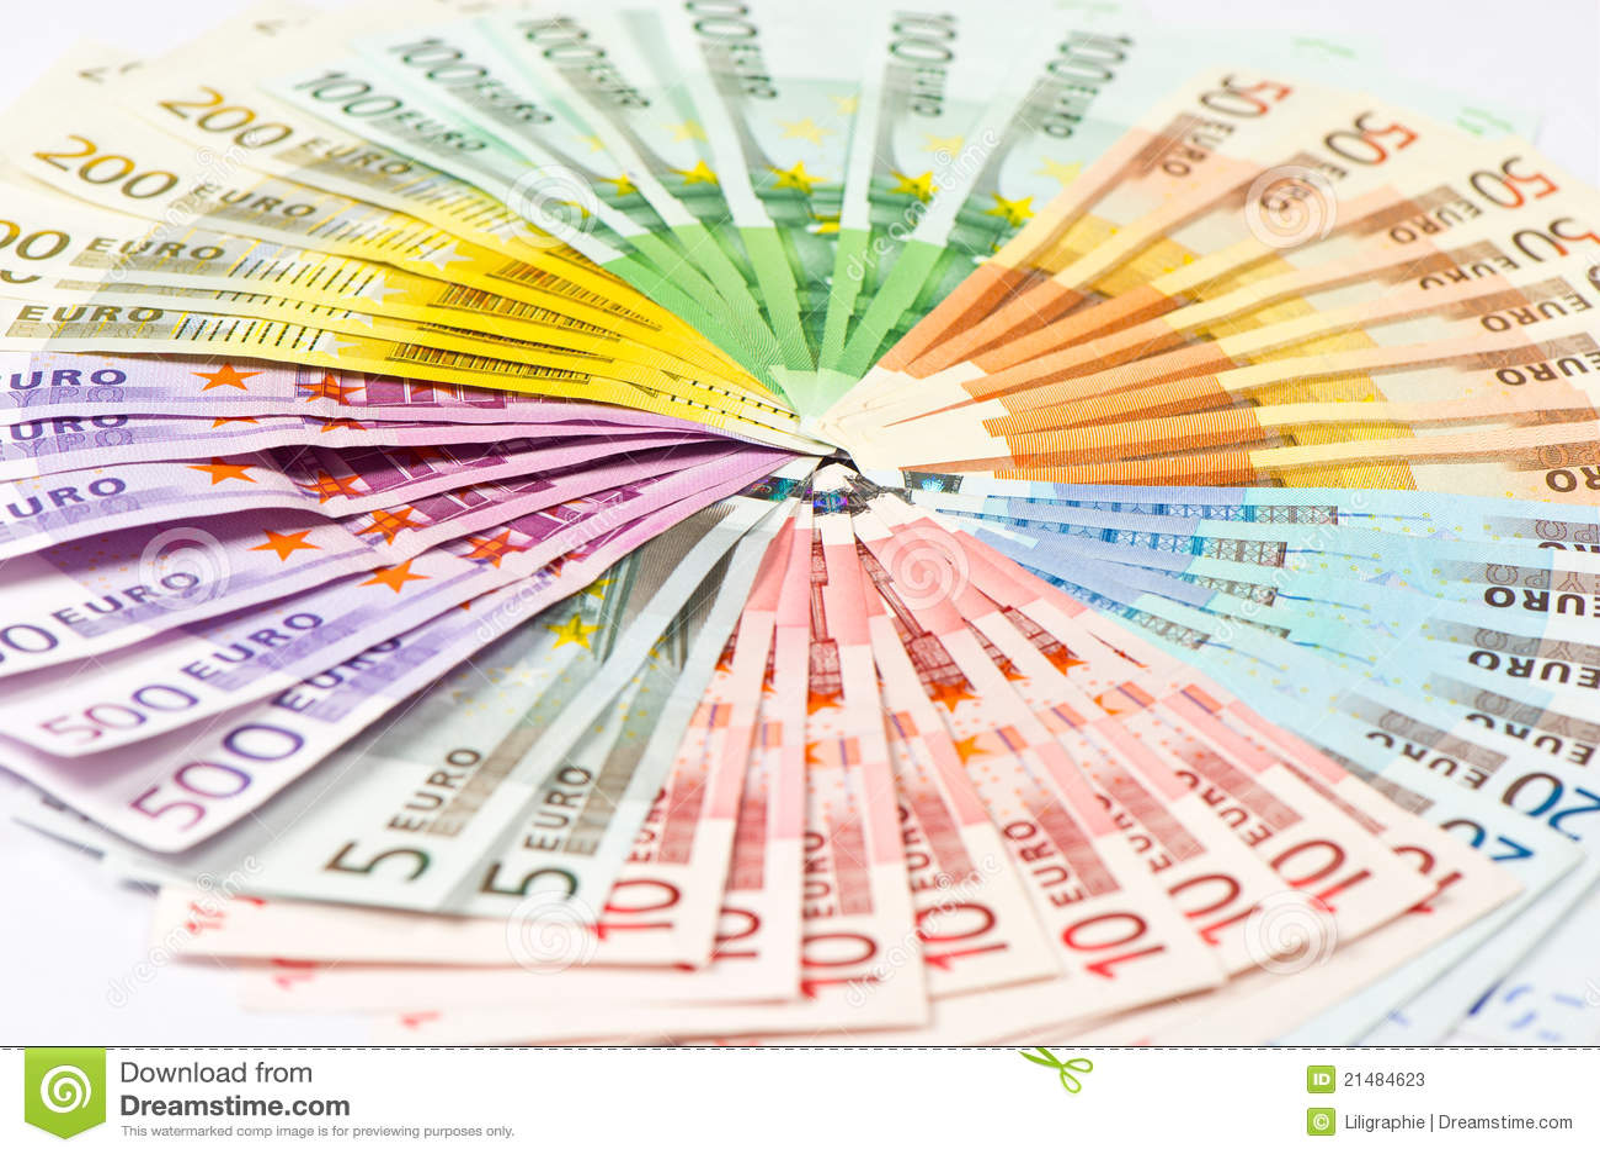 Citaten Geld Xi : Euro bankbiljetten geld achtergrond stock afbeelding